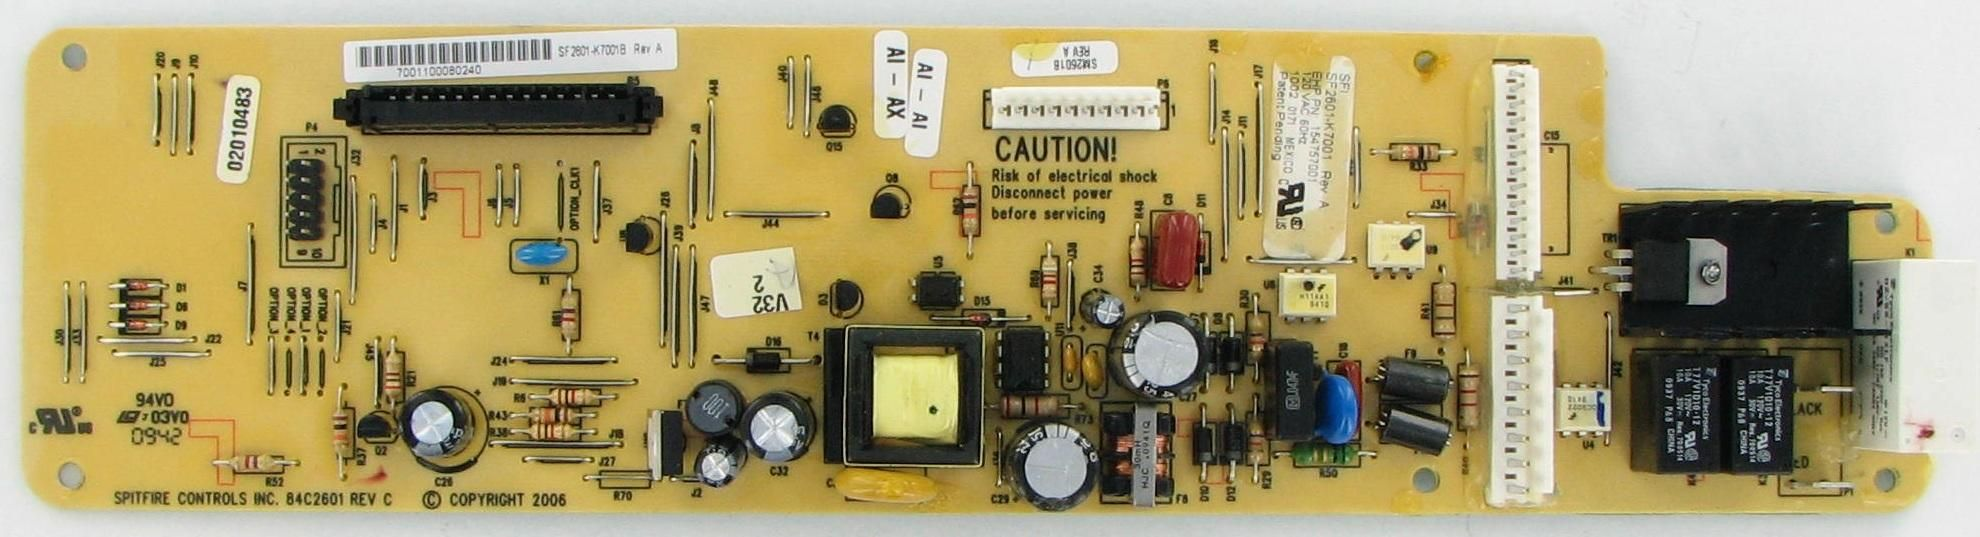 Frigidaire 154757001 Dishwasher Electronic Control Board Frigidaire Dishwasher Diswasher Frigidaire